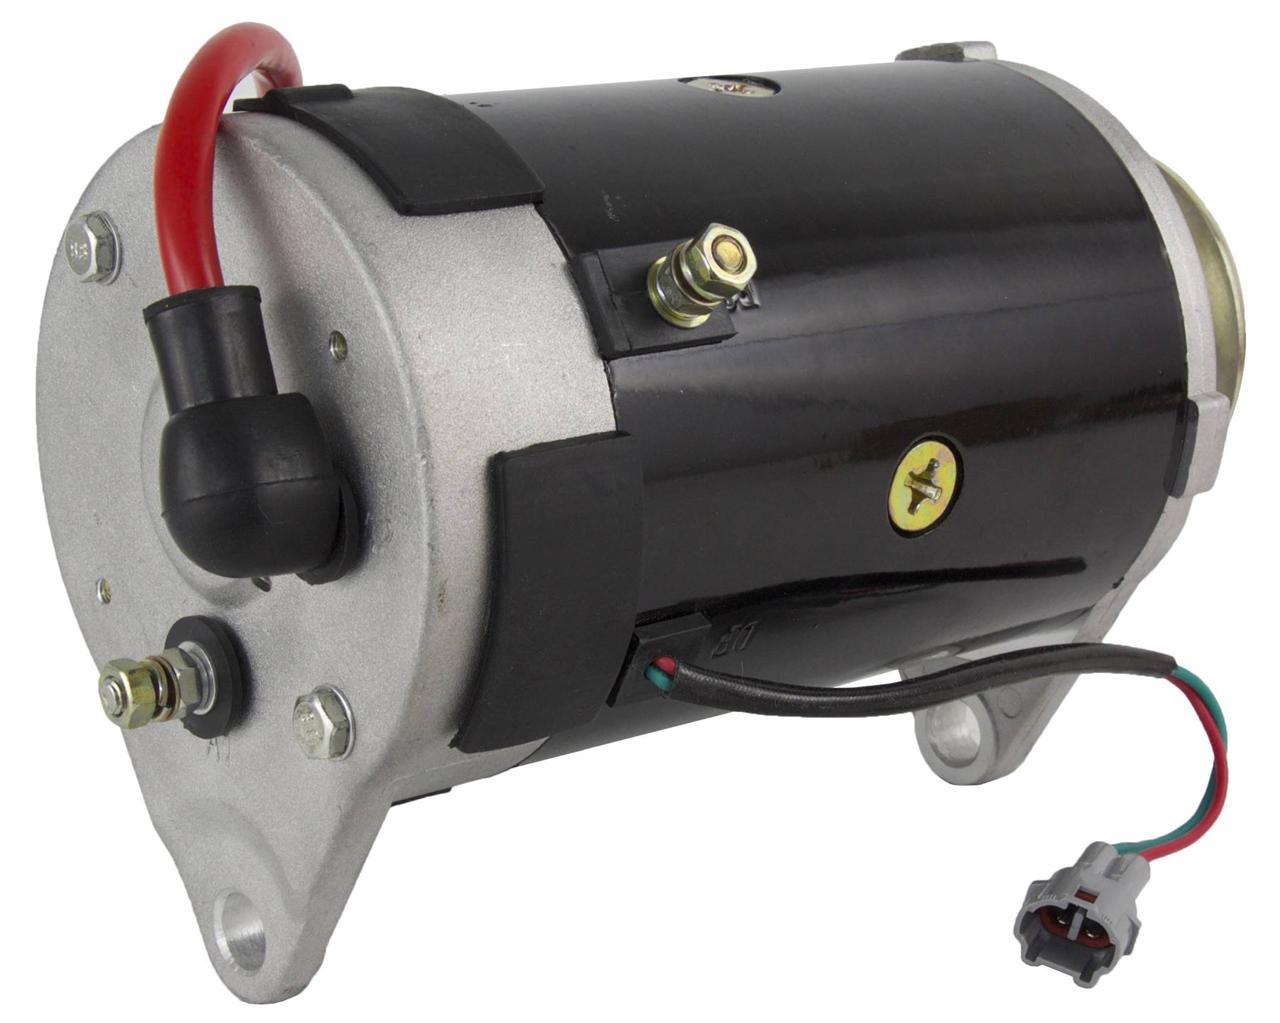 starter generator yamaha golf cart g16 g22 jn6 h1100 00 00. Black Bedroom Furniture Sets. Home Design Ideas